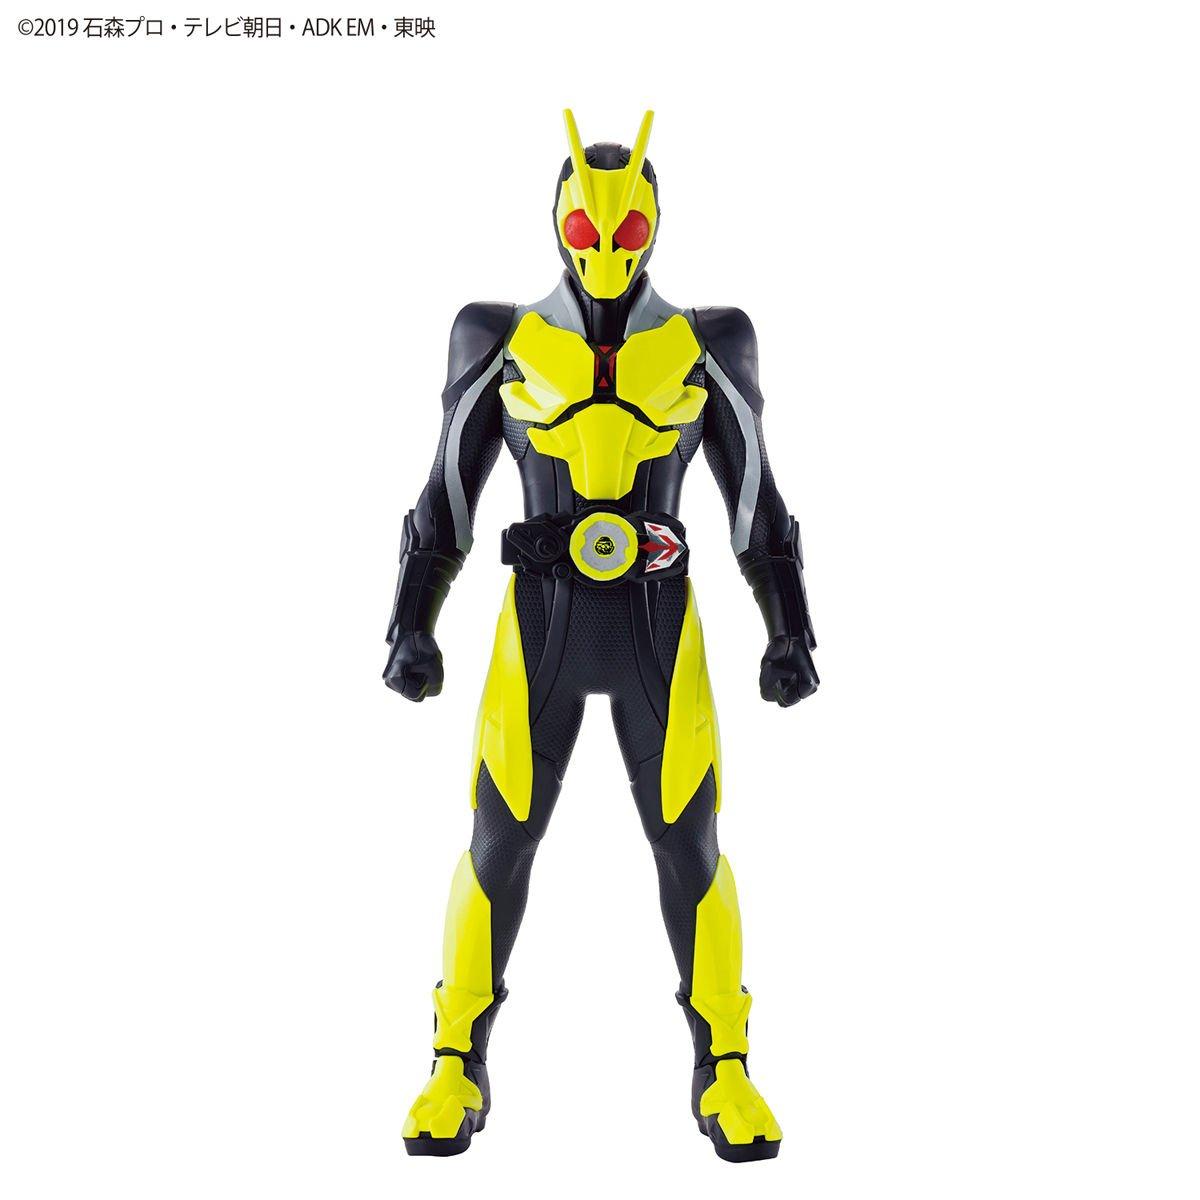 ENTRY GRADE 假面騎士 ZERO-ONE RISING HOPPER